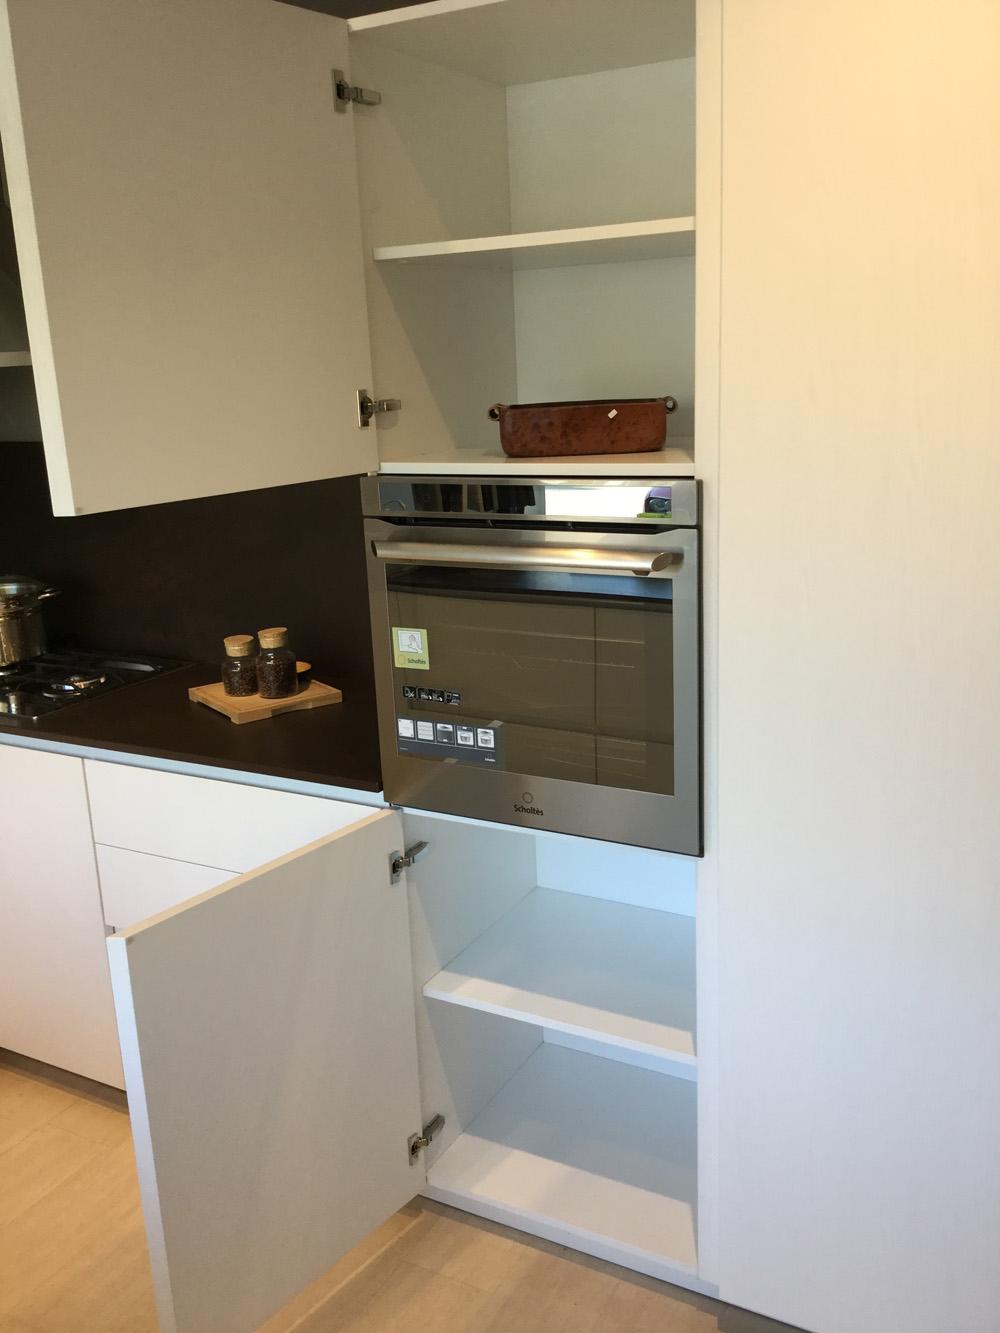 Cucina arrital cucine bianca e cemento moderna legno bianche cucine a prezzi scontati for Piano cucina in cemento